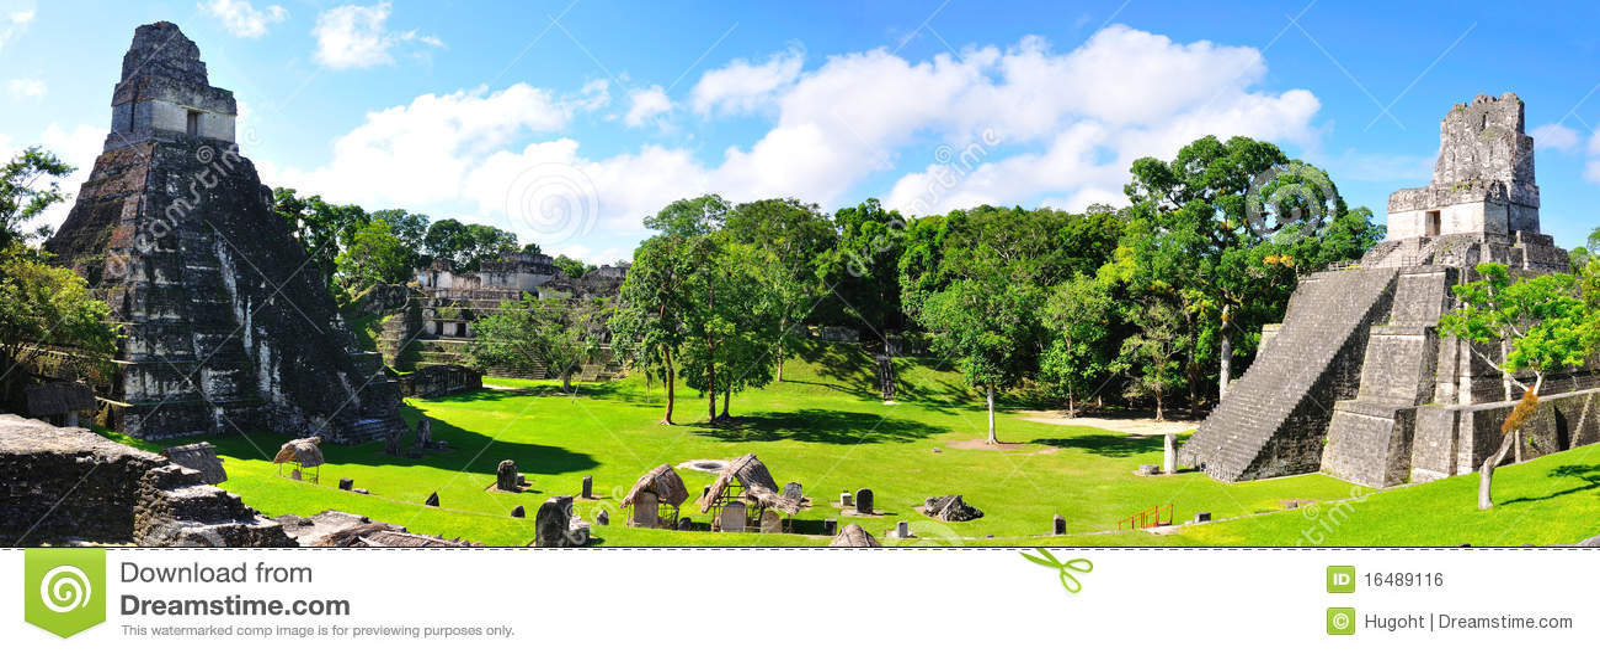 Templos antiguos del maya de Tikal, Guatemala